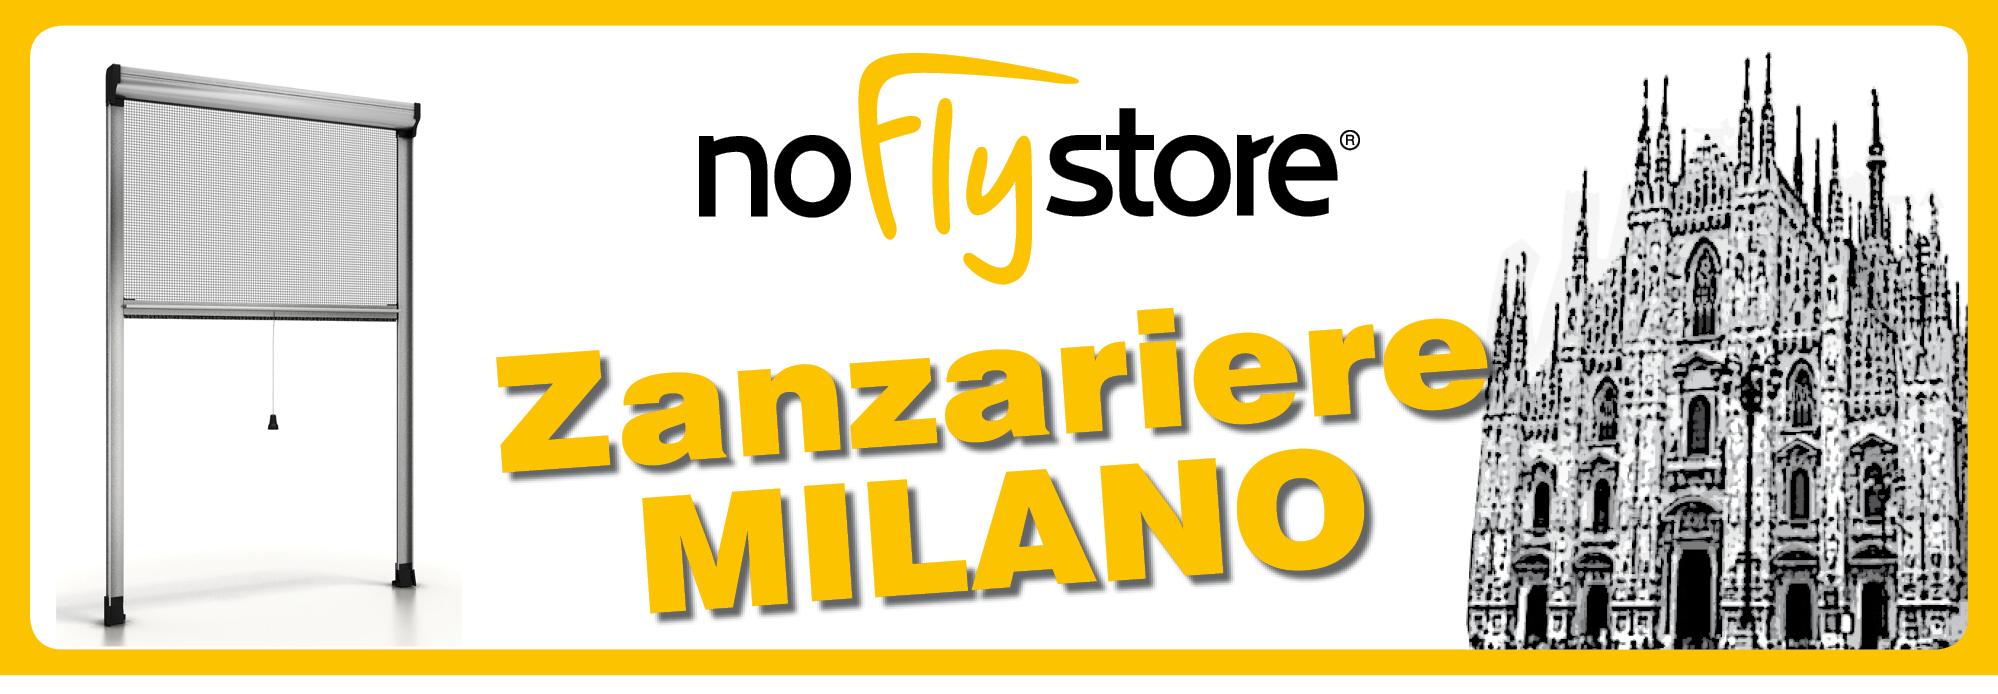 Zanzariere a Milano - Offerte NoFlyStore